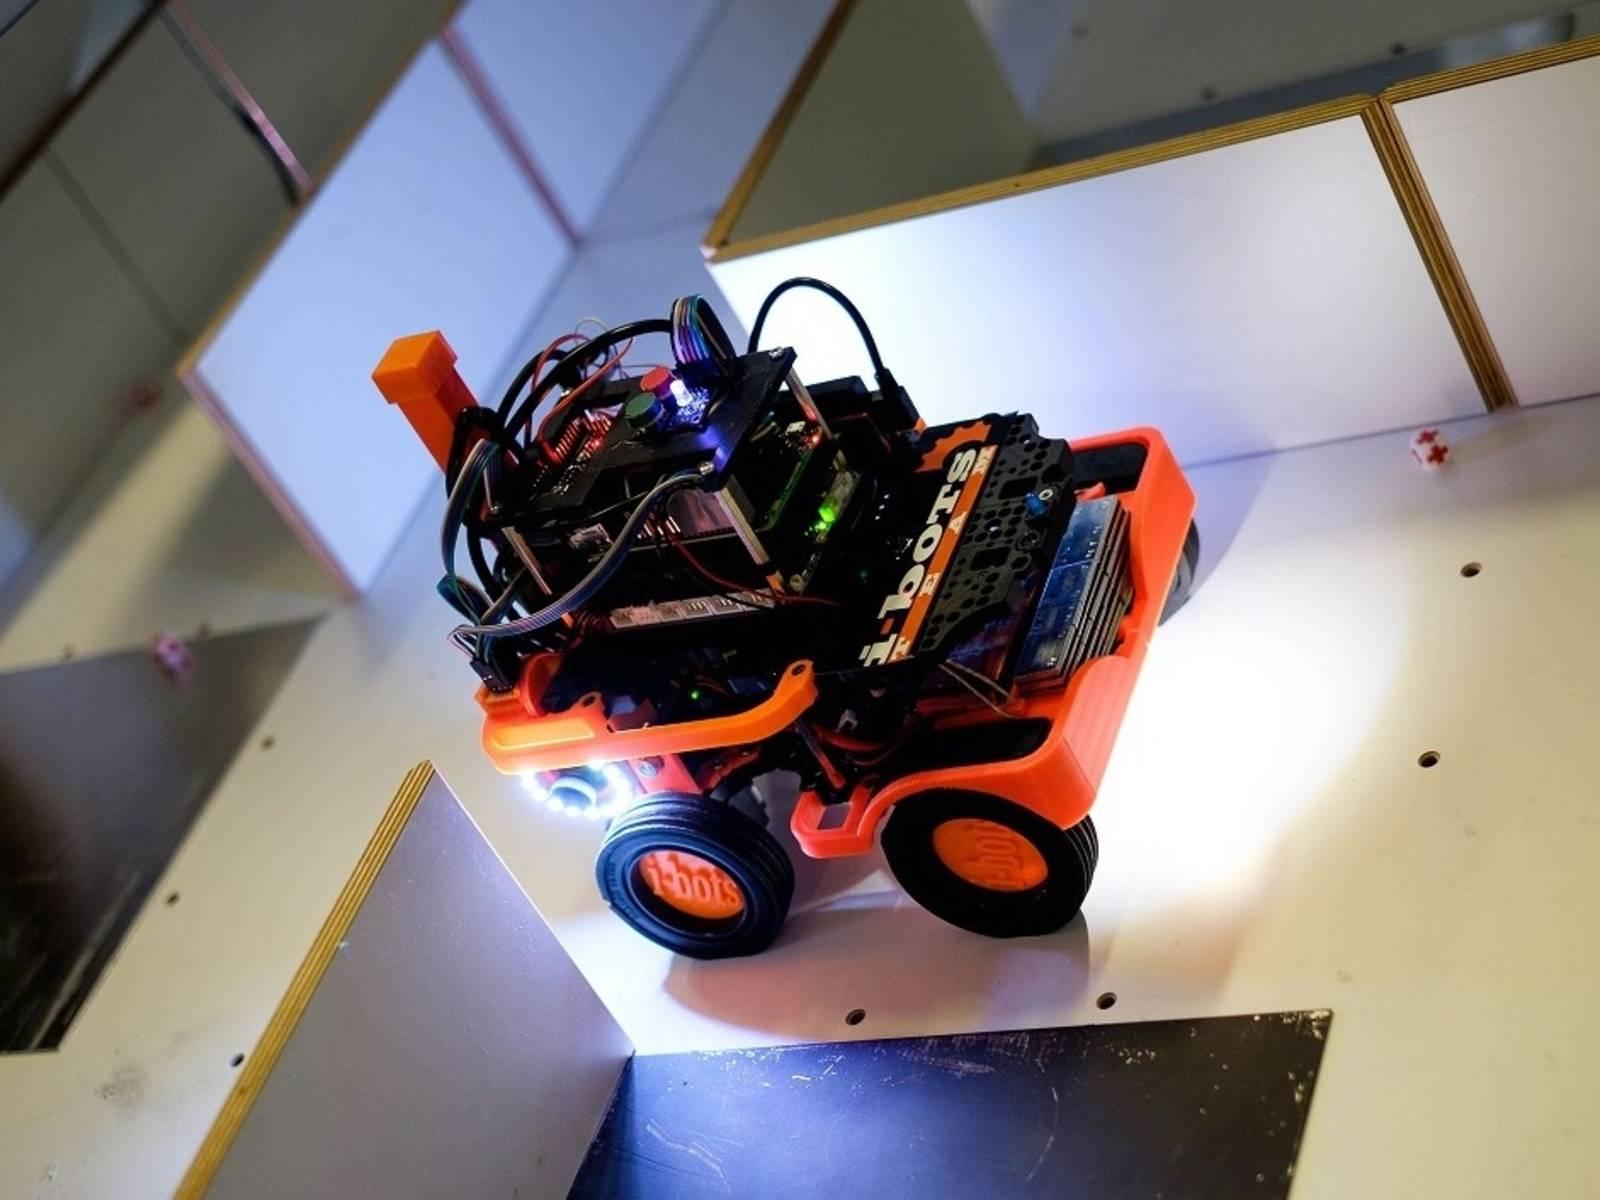 Impressionen Qualifizierung RoboCup2019